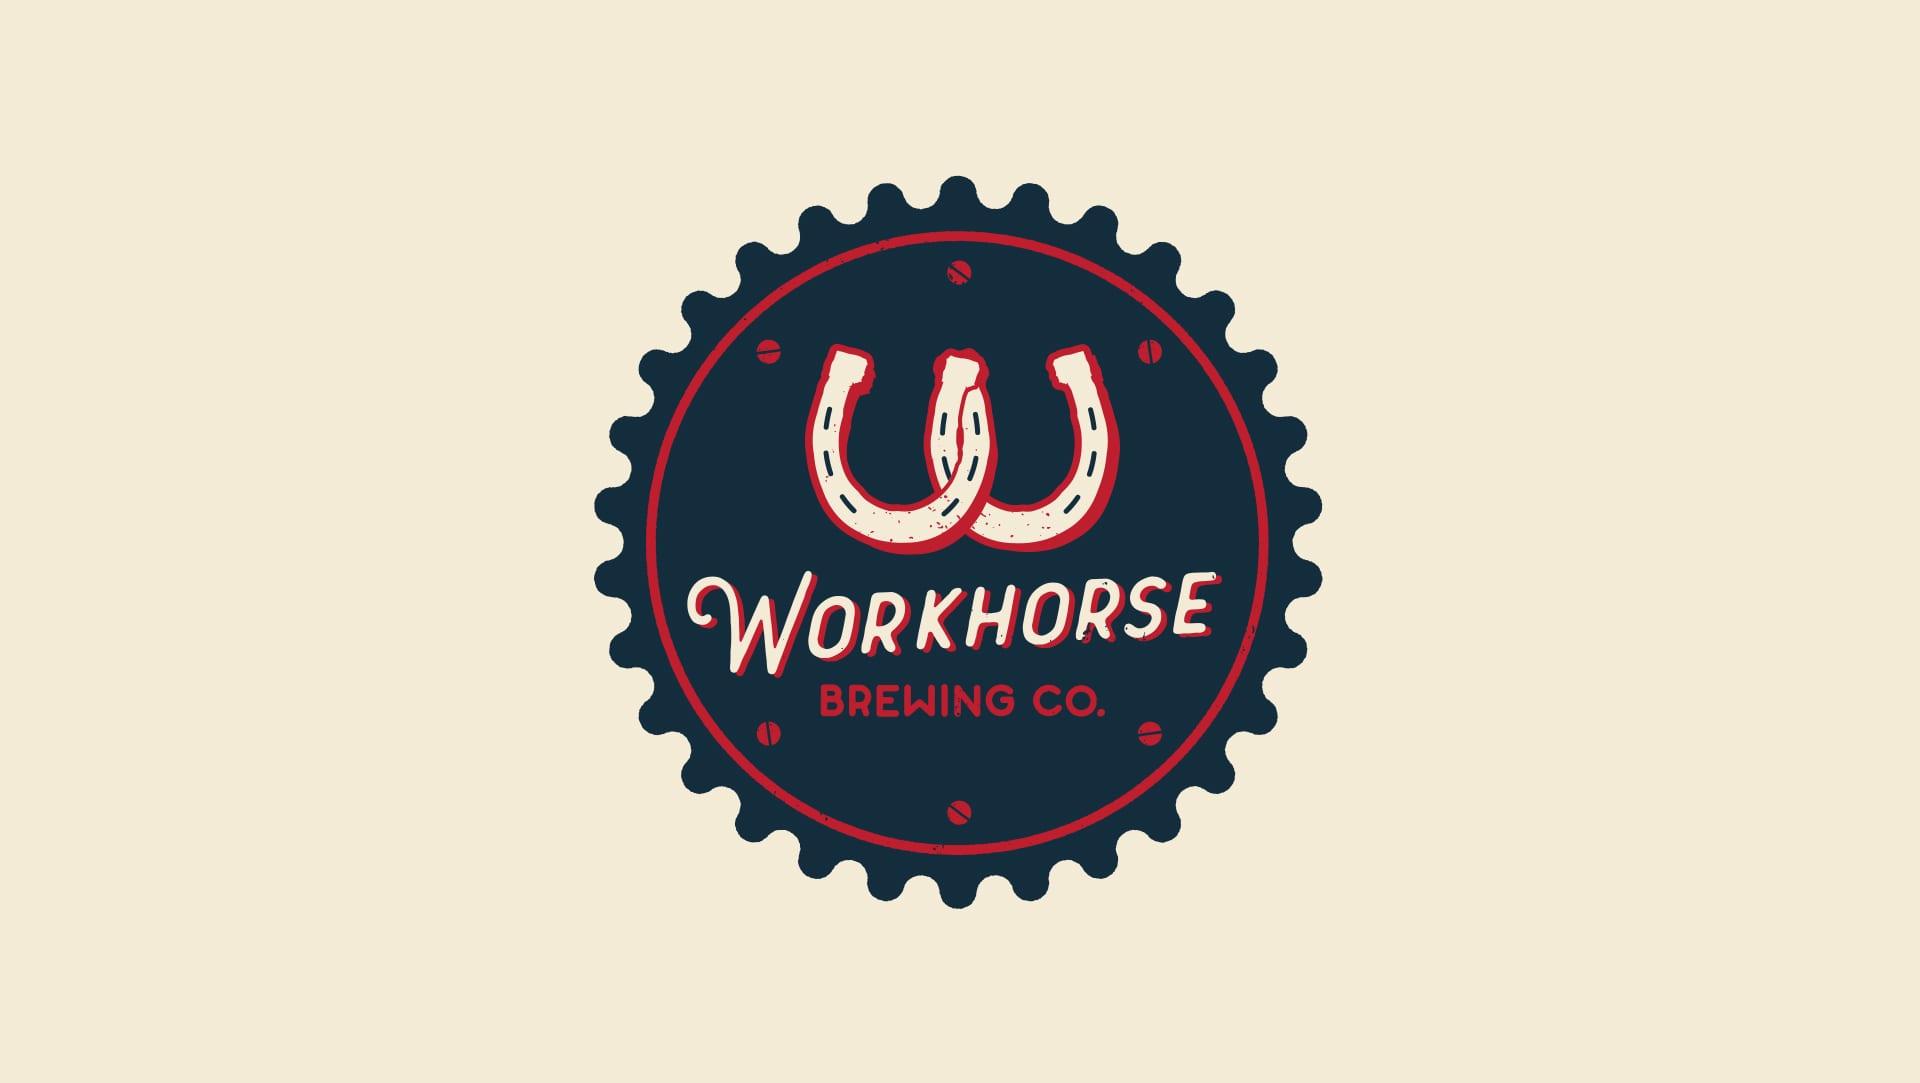 Workhorse Brewing Co  - Finch Brands